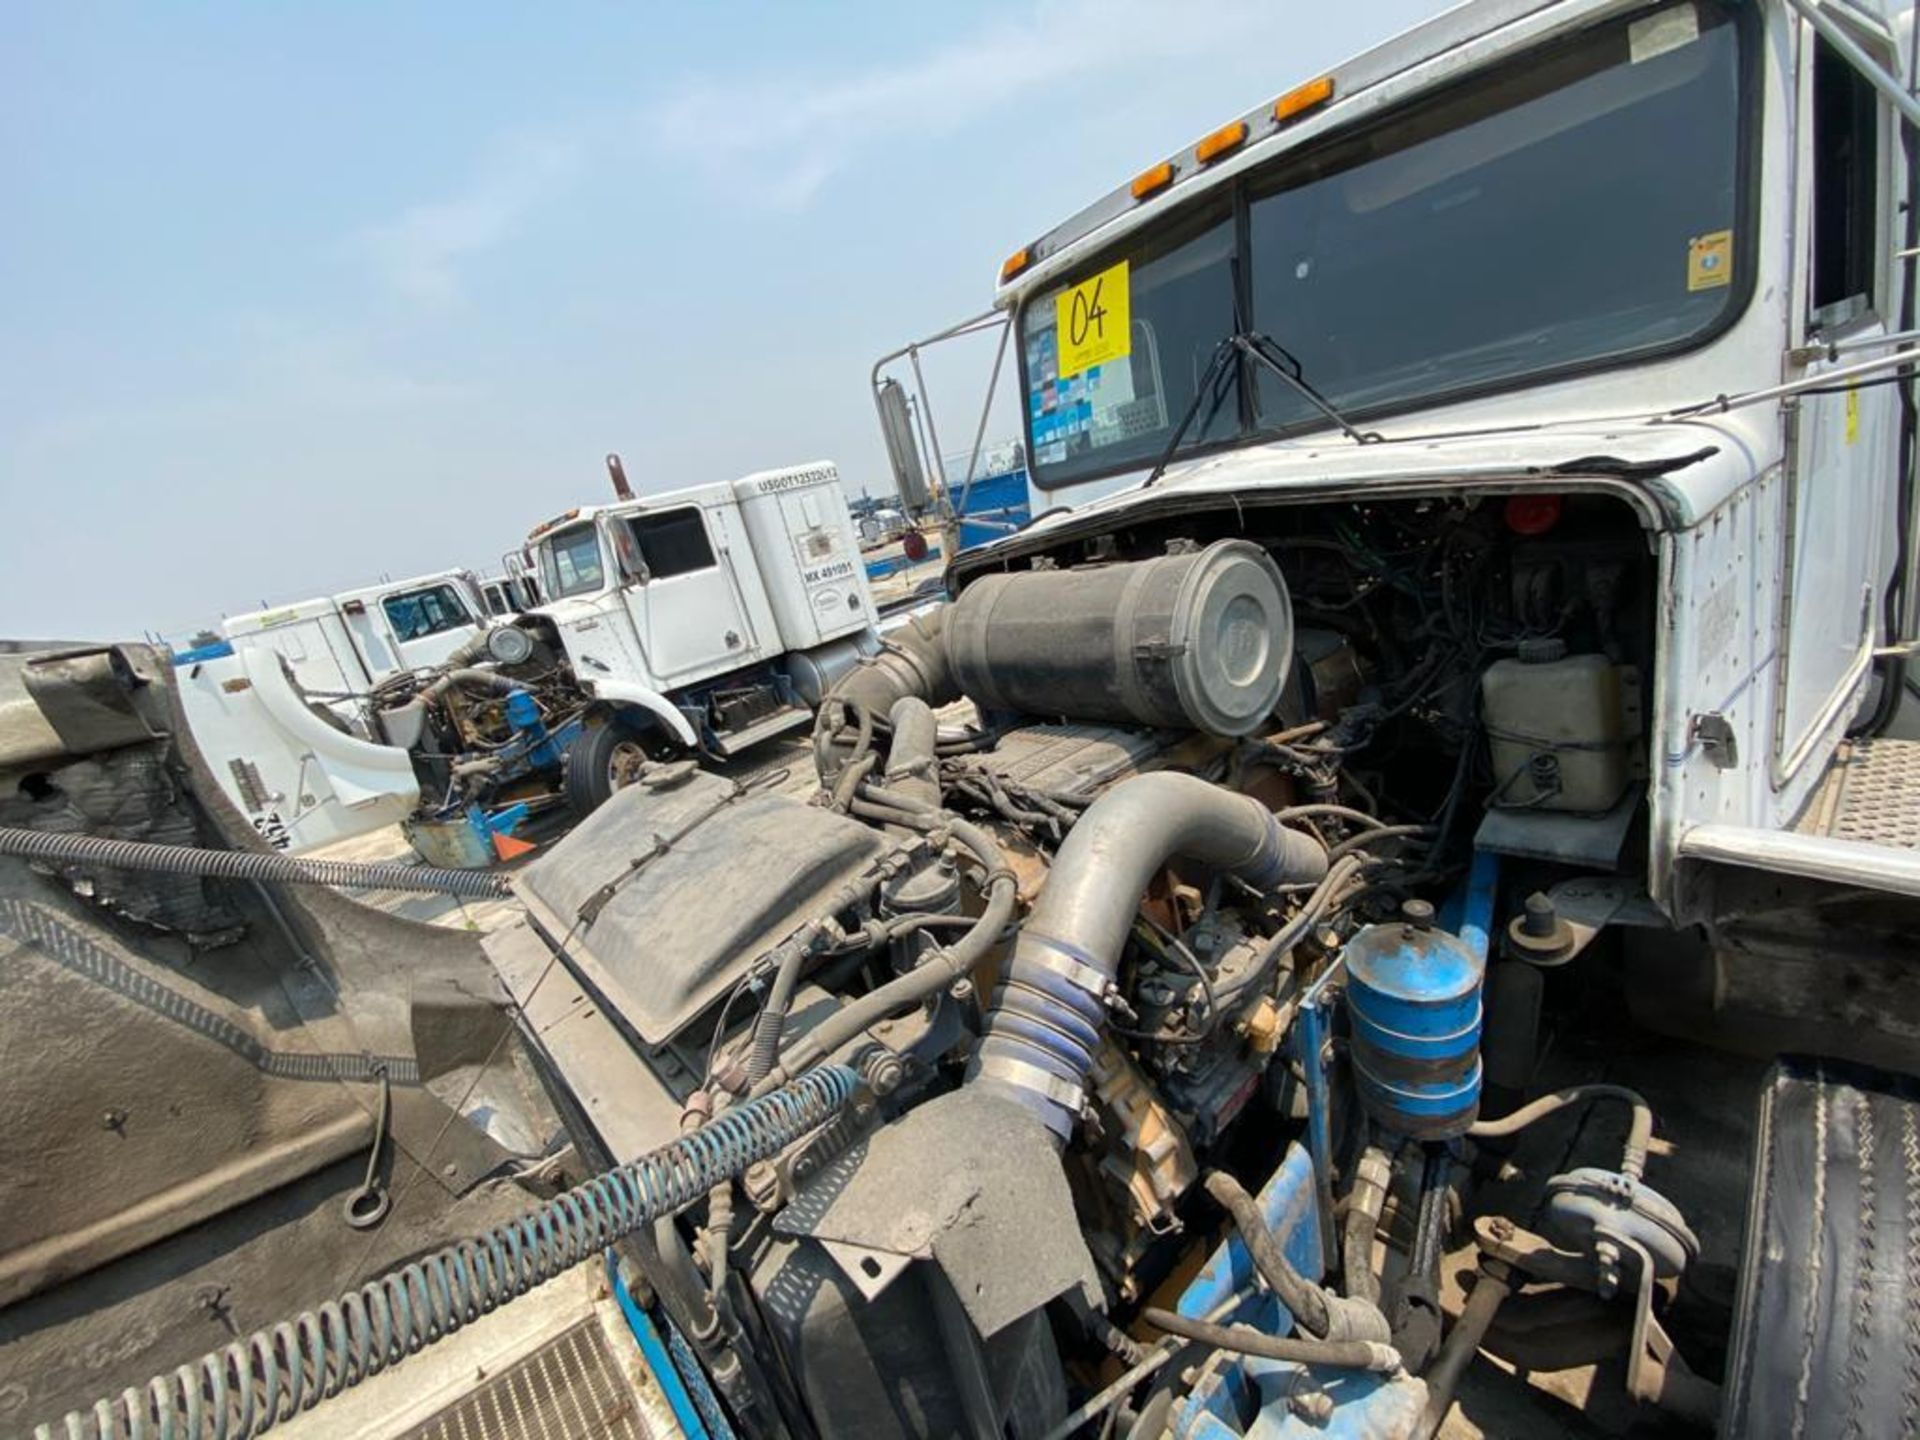 1999 Kenworth Sleeper truck tractor, standard transmission of 18 speeds - Image 60 of 70